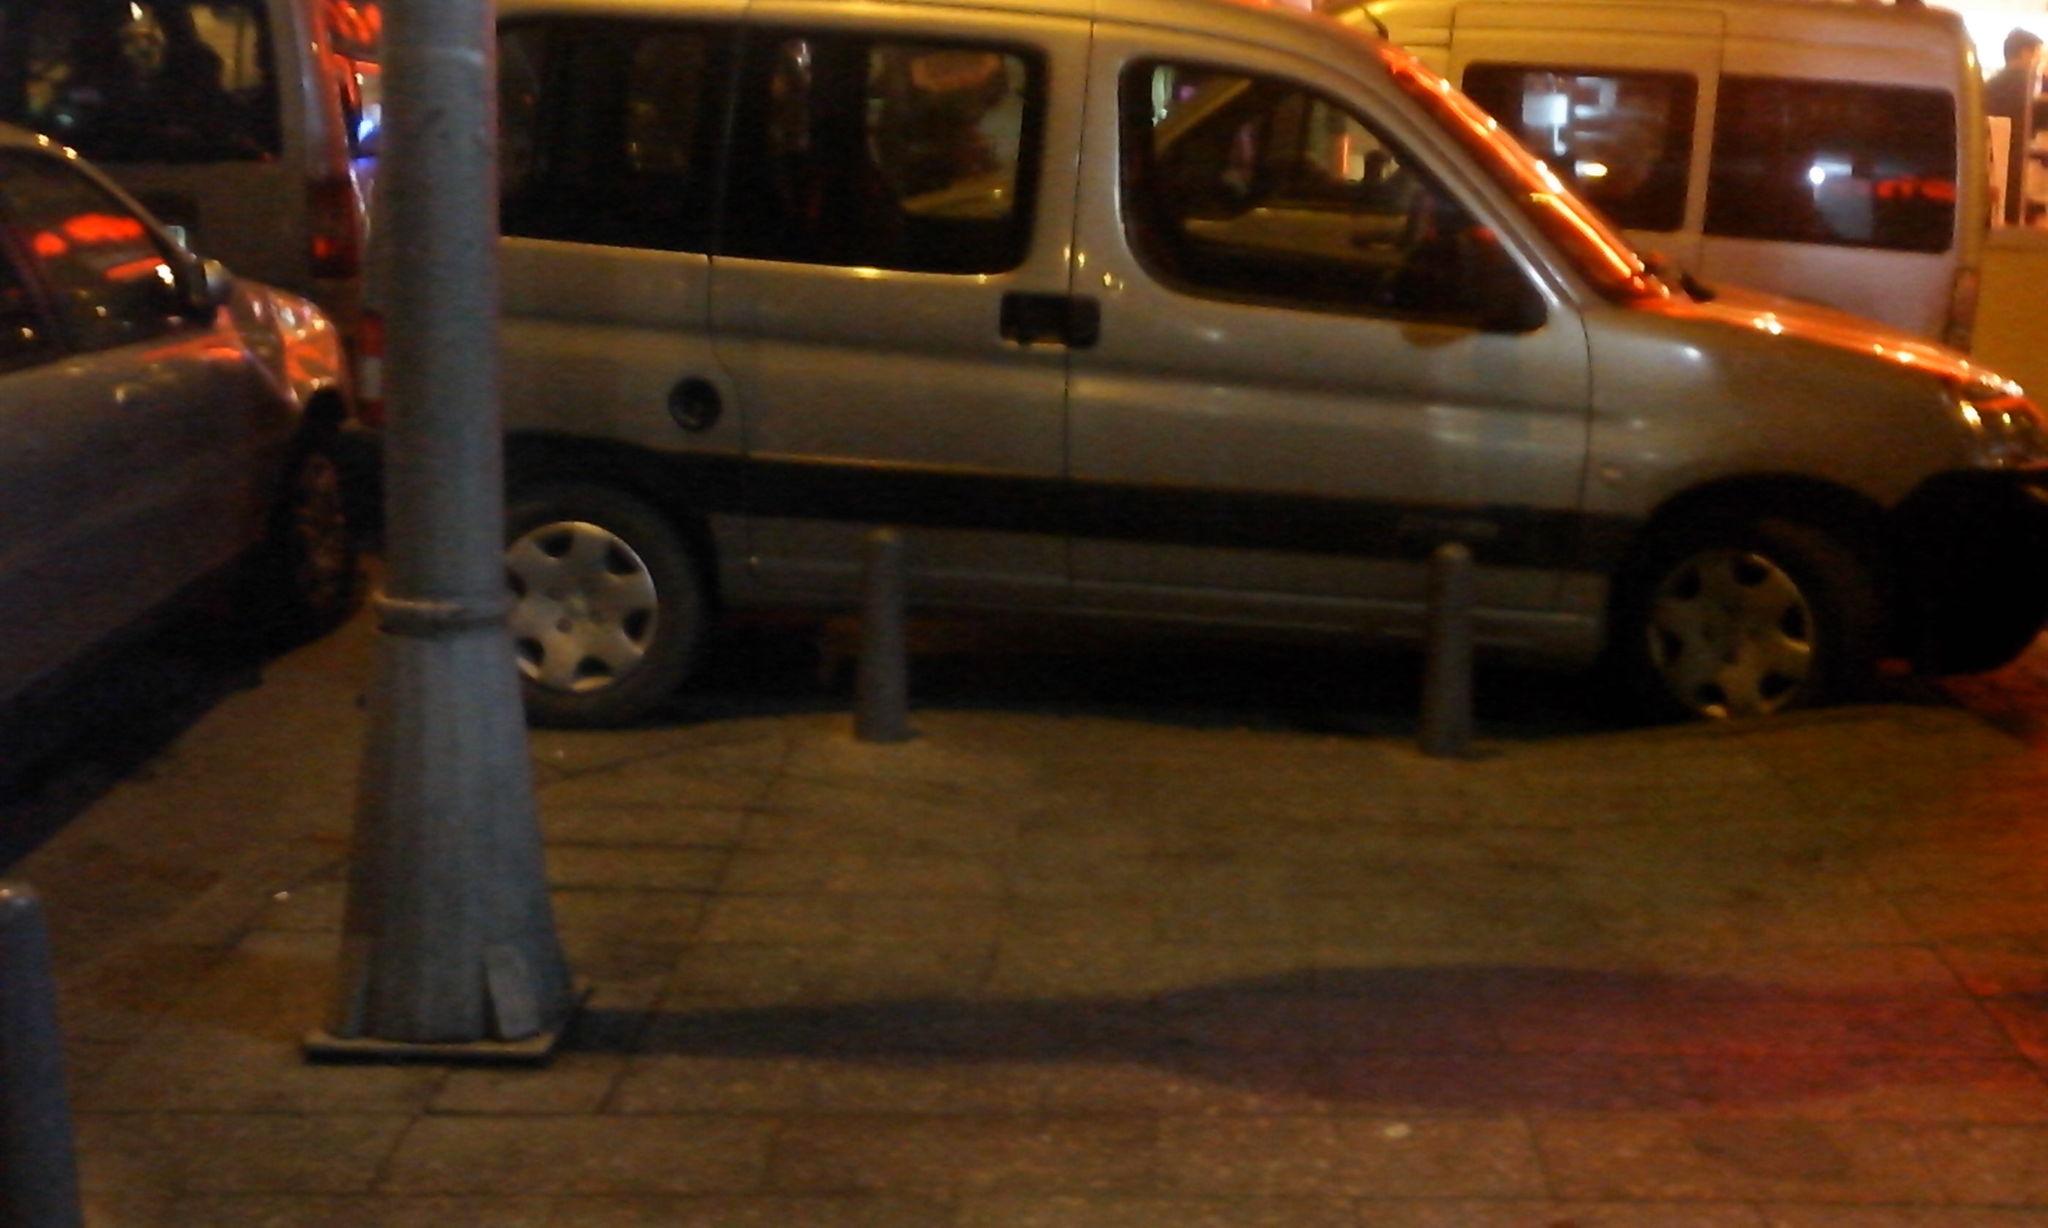 xA0GYX - Ka��thane'de engelli rampas�n�n �n�ne park edilmi�! Bunlar�n yapt�g� insanl�k m�!